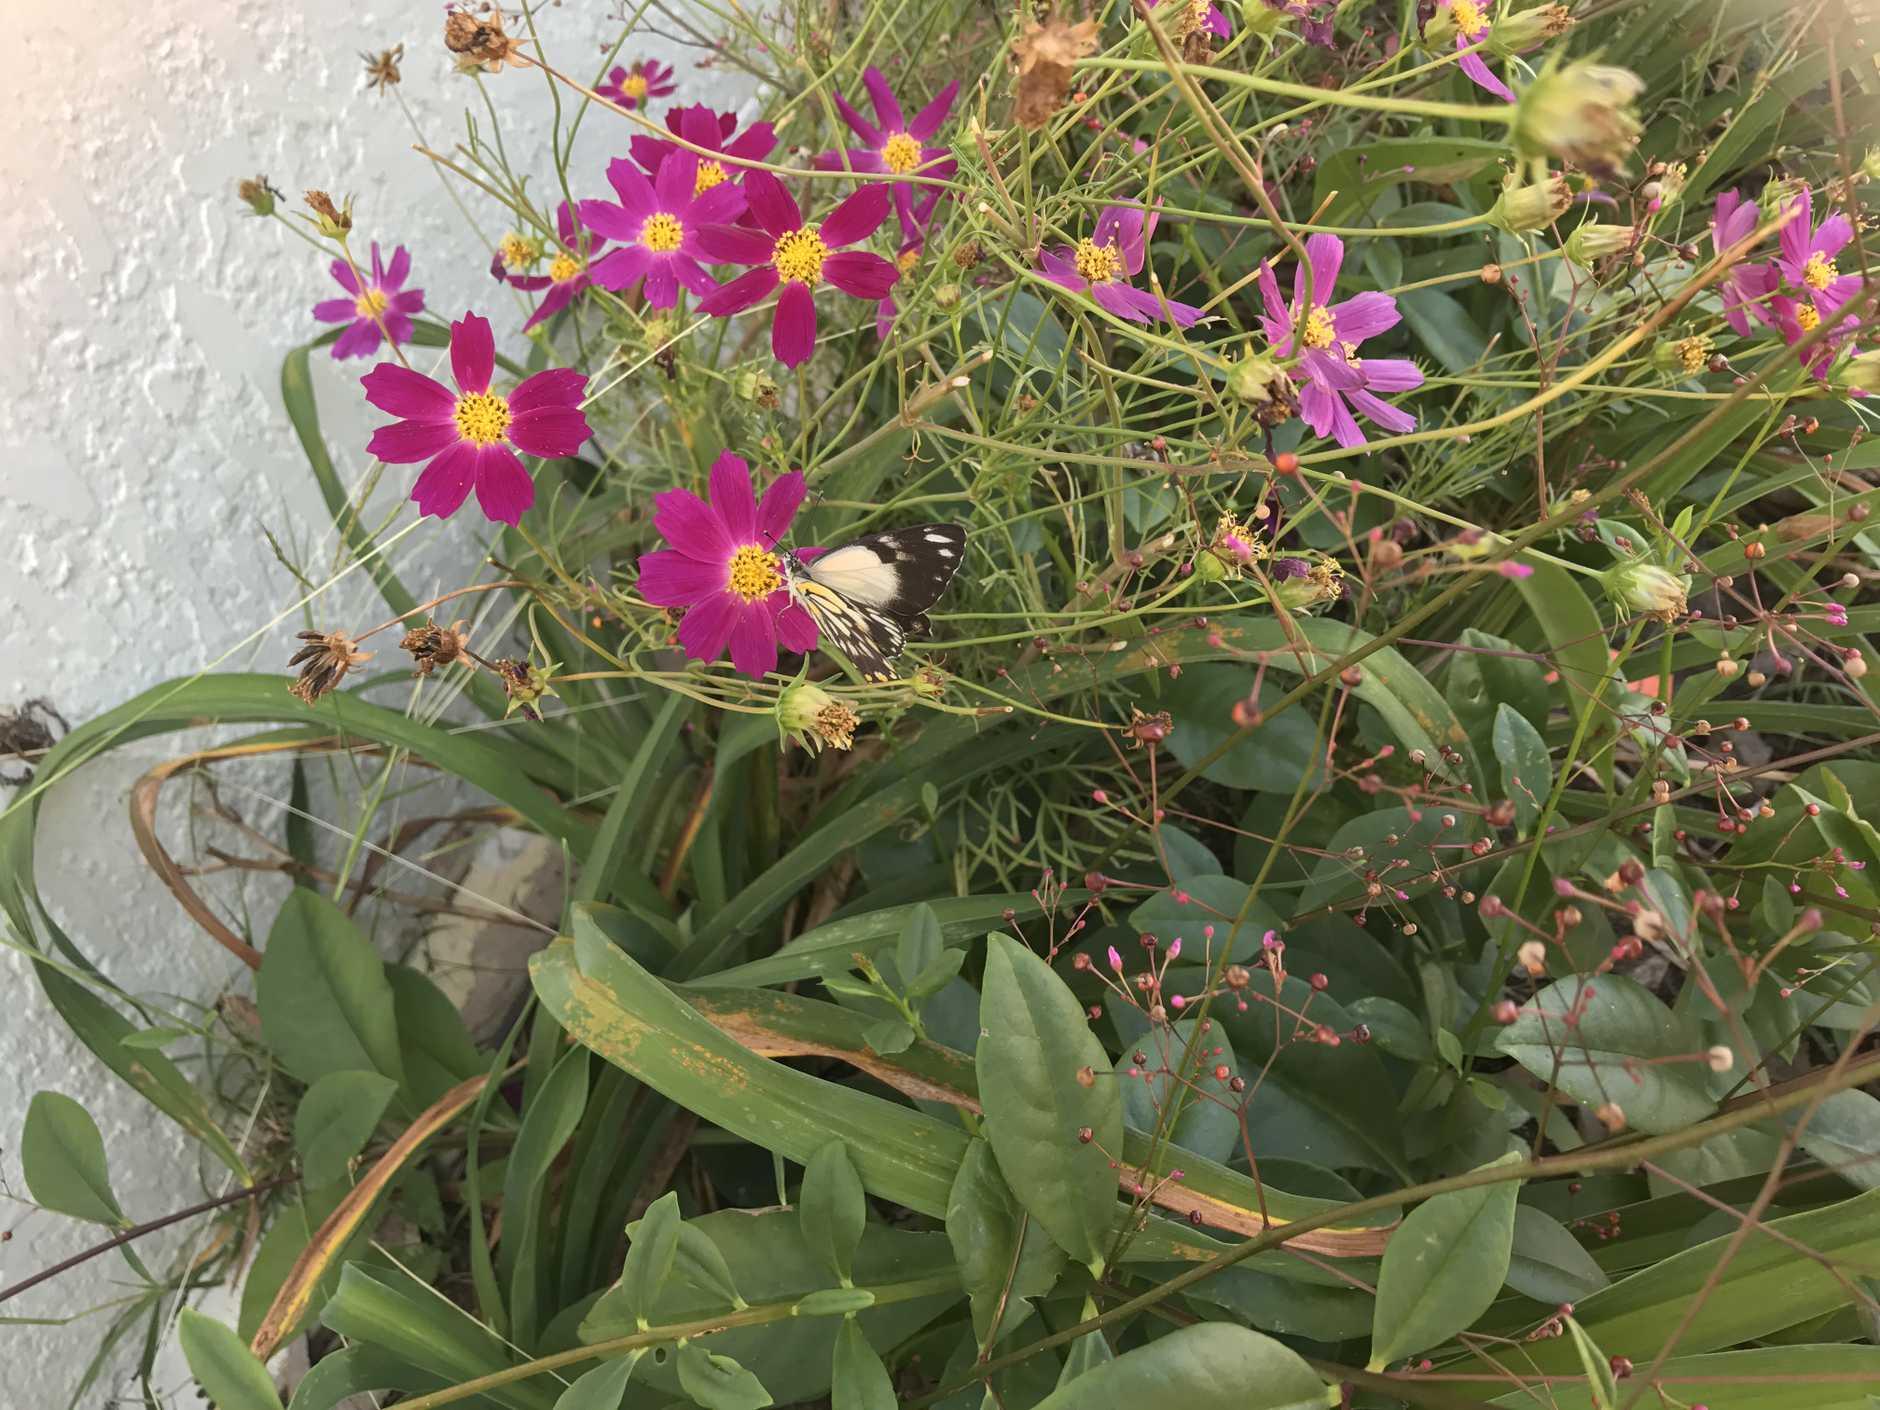 Butterflies have been fluttering in to the region.